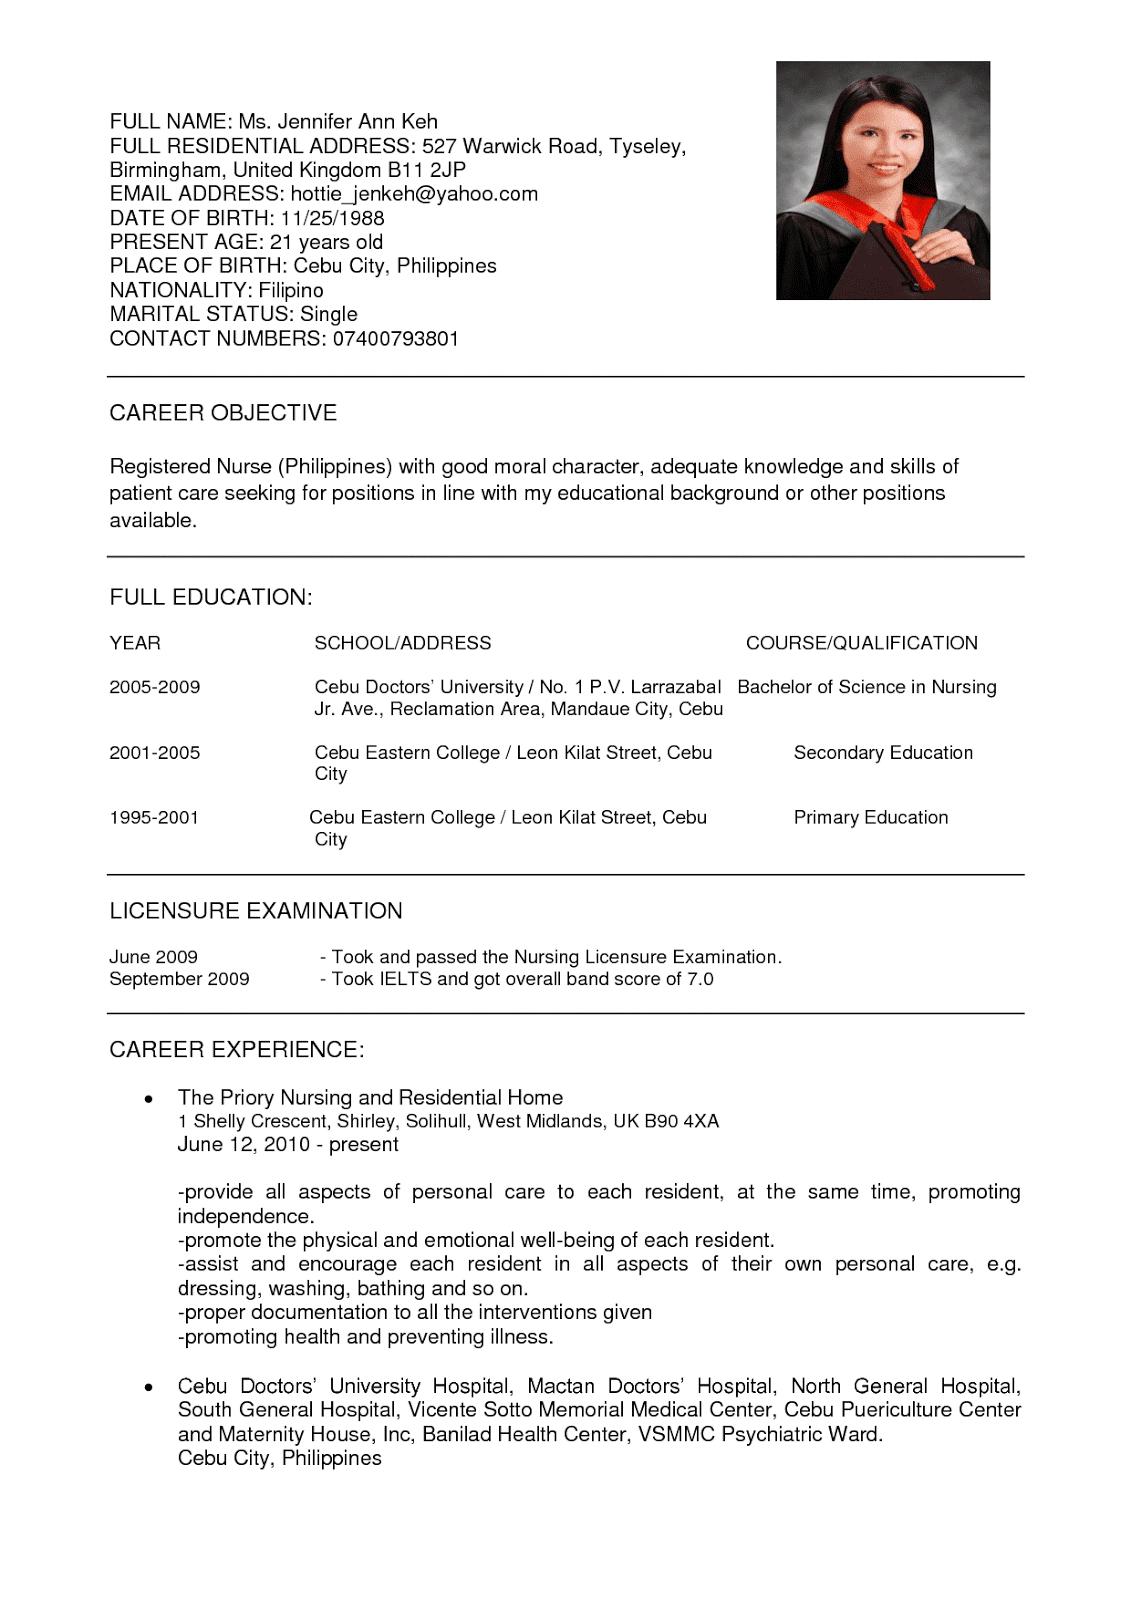 Resume For Nurses Applying Abroad Nursing resume